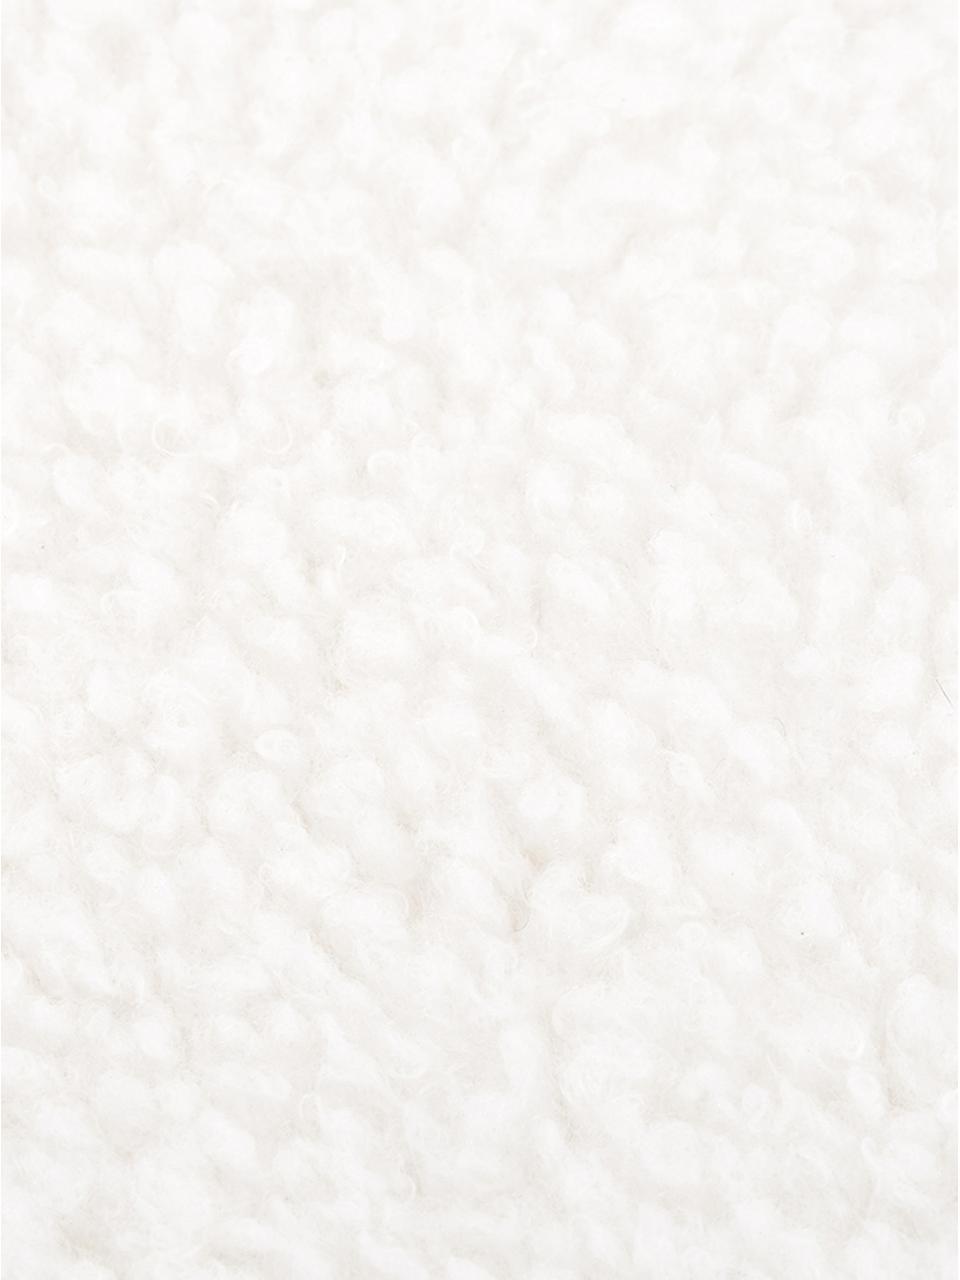 Flauschige Teddy-Kissenhülle Mille in Creme, Vorderseite: 100% Polyester (Teddyfell, Rückseite: 100% Polyester (Teddyfell, Creme, 30 x 50 cm